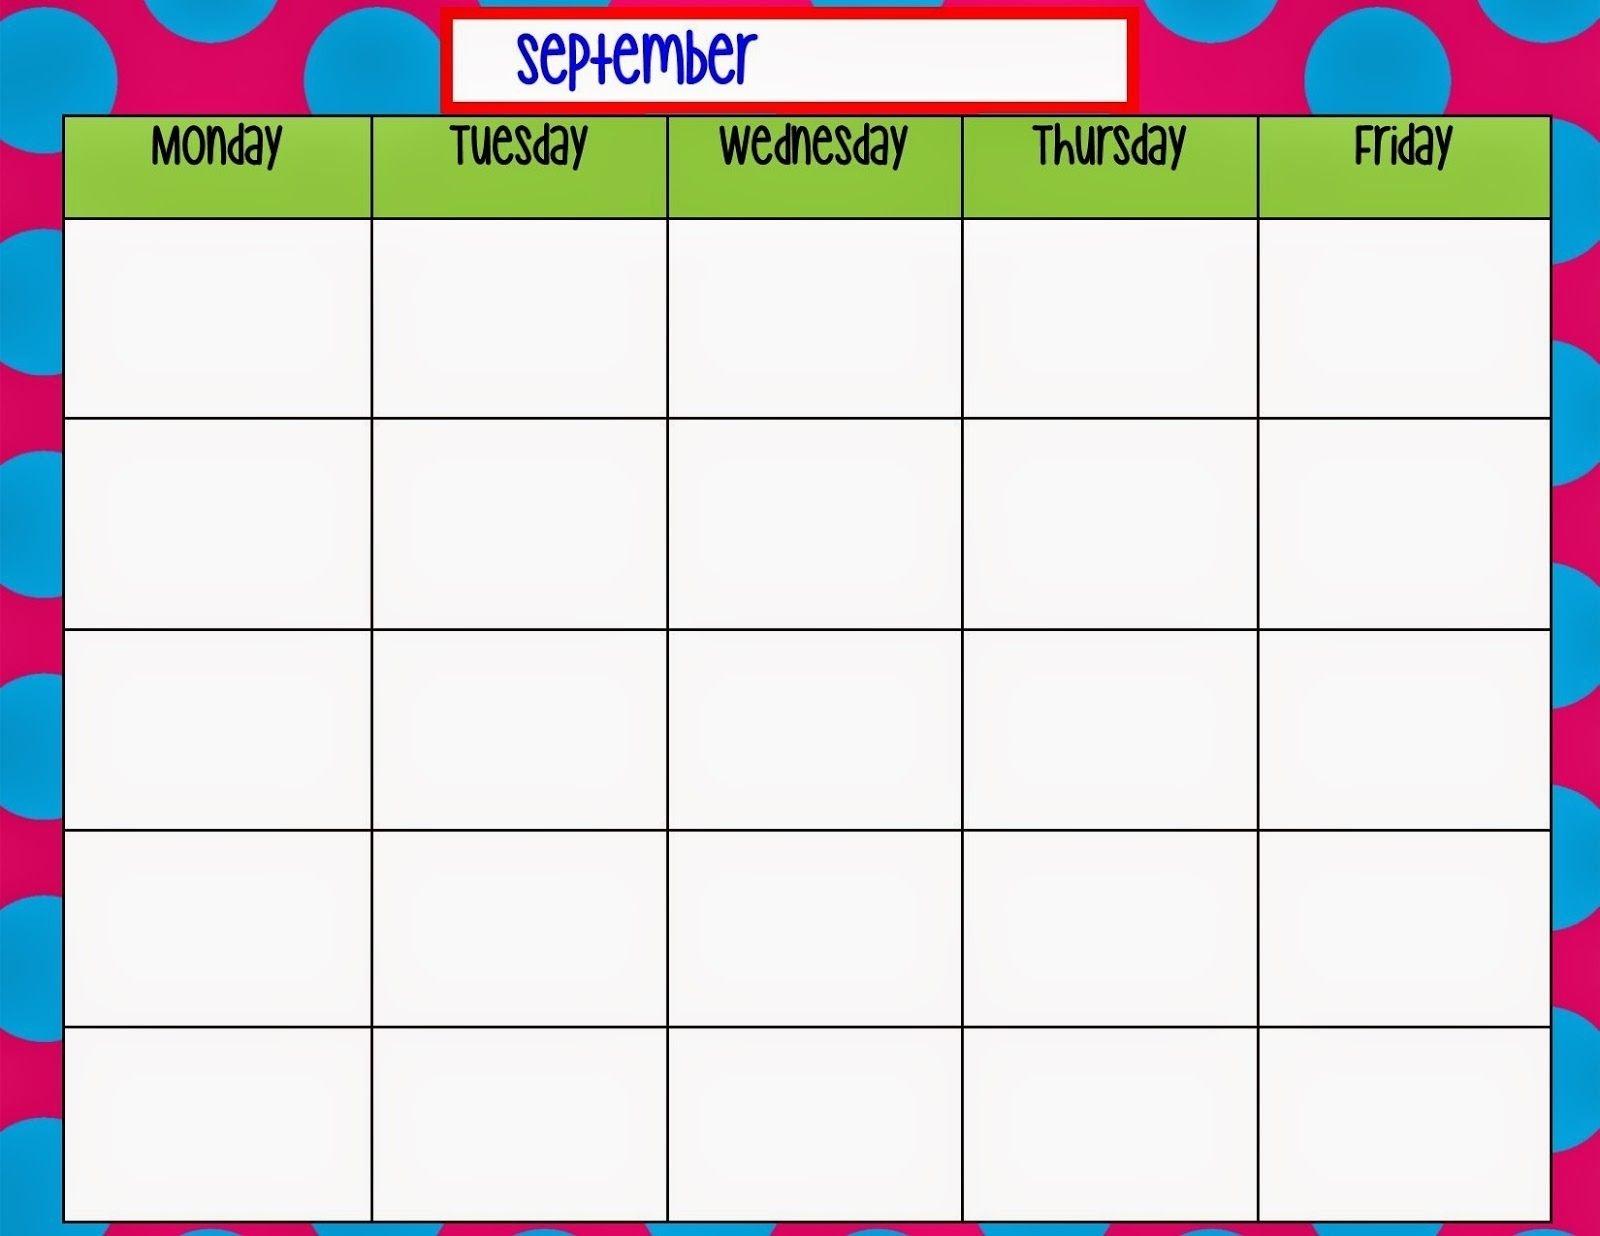 Monday Through Friday Schedule Printable - Calendar Printable Monday To Friday Timetable